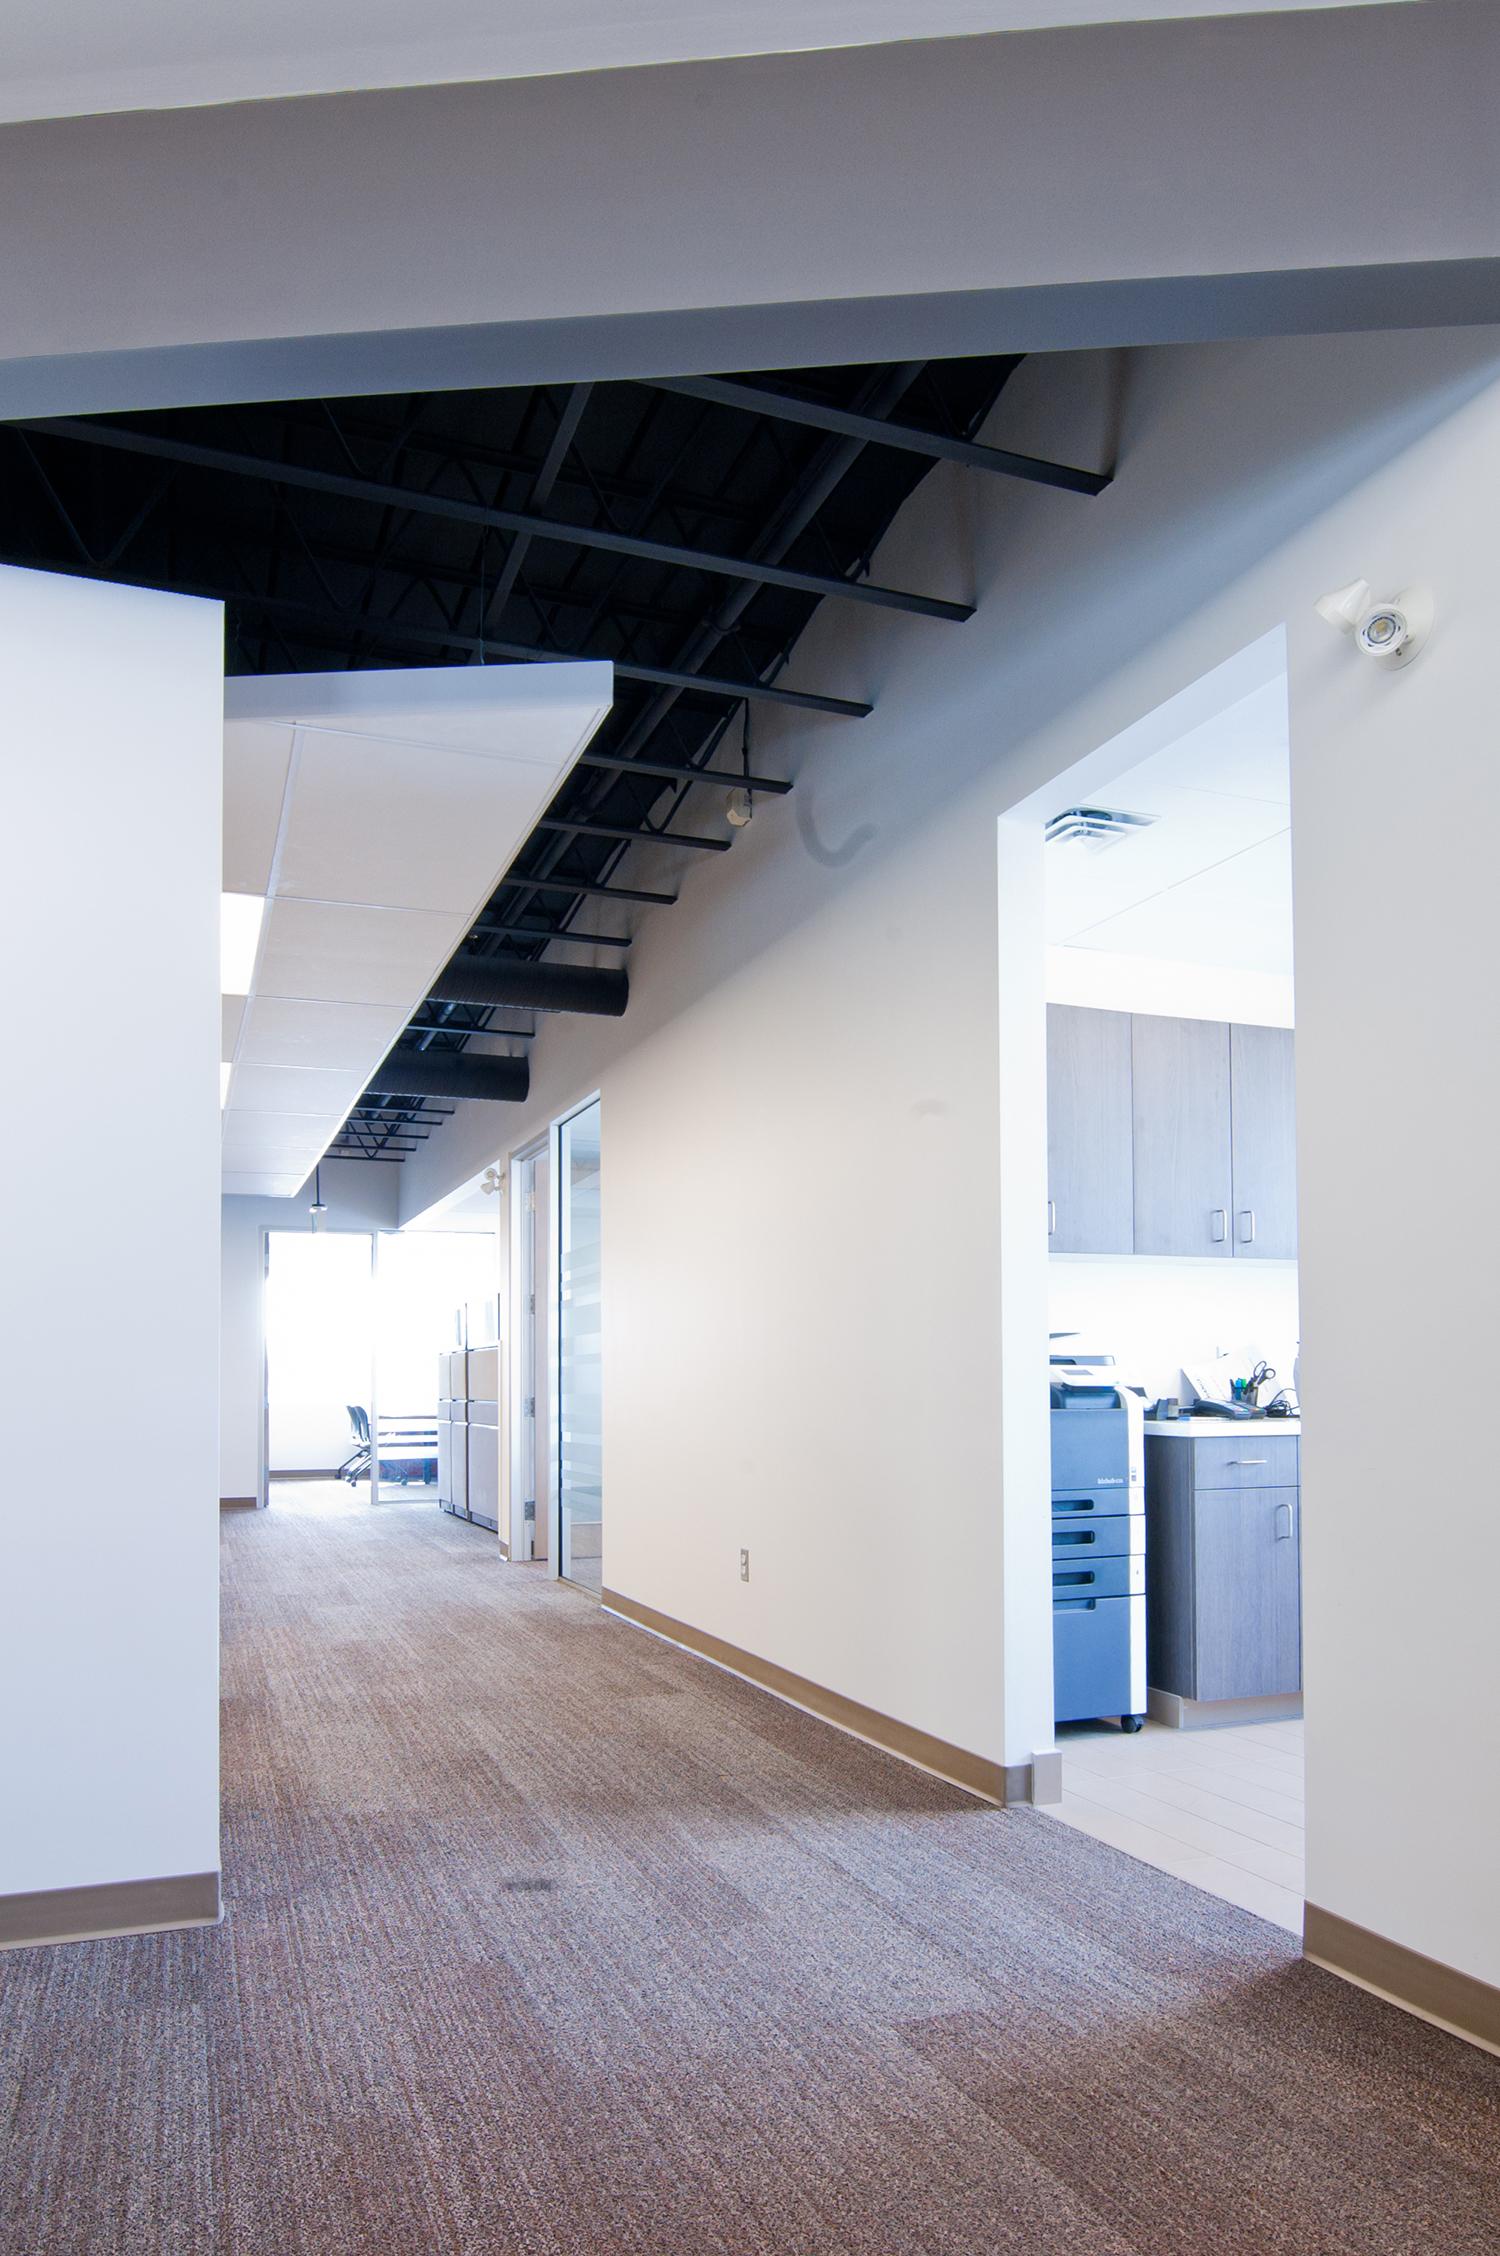 Exchange Group Offices, interior photo of hallway / Photo: Derrick Finch